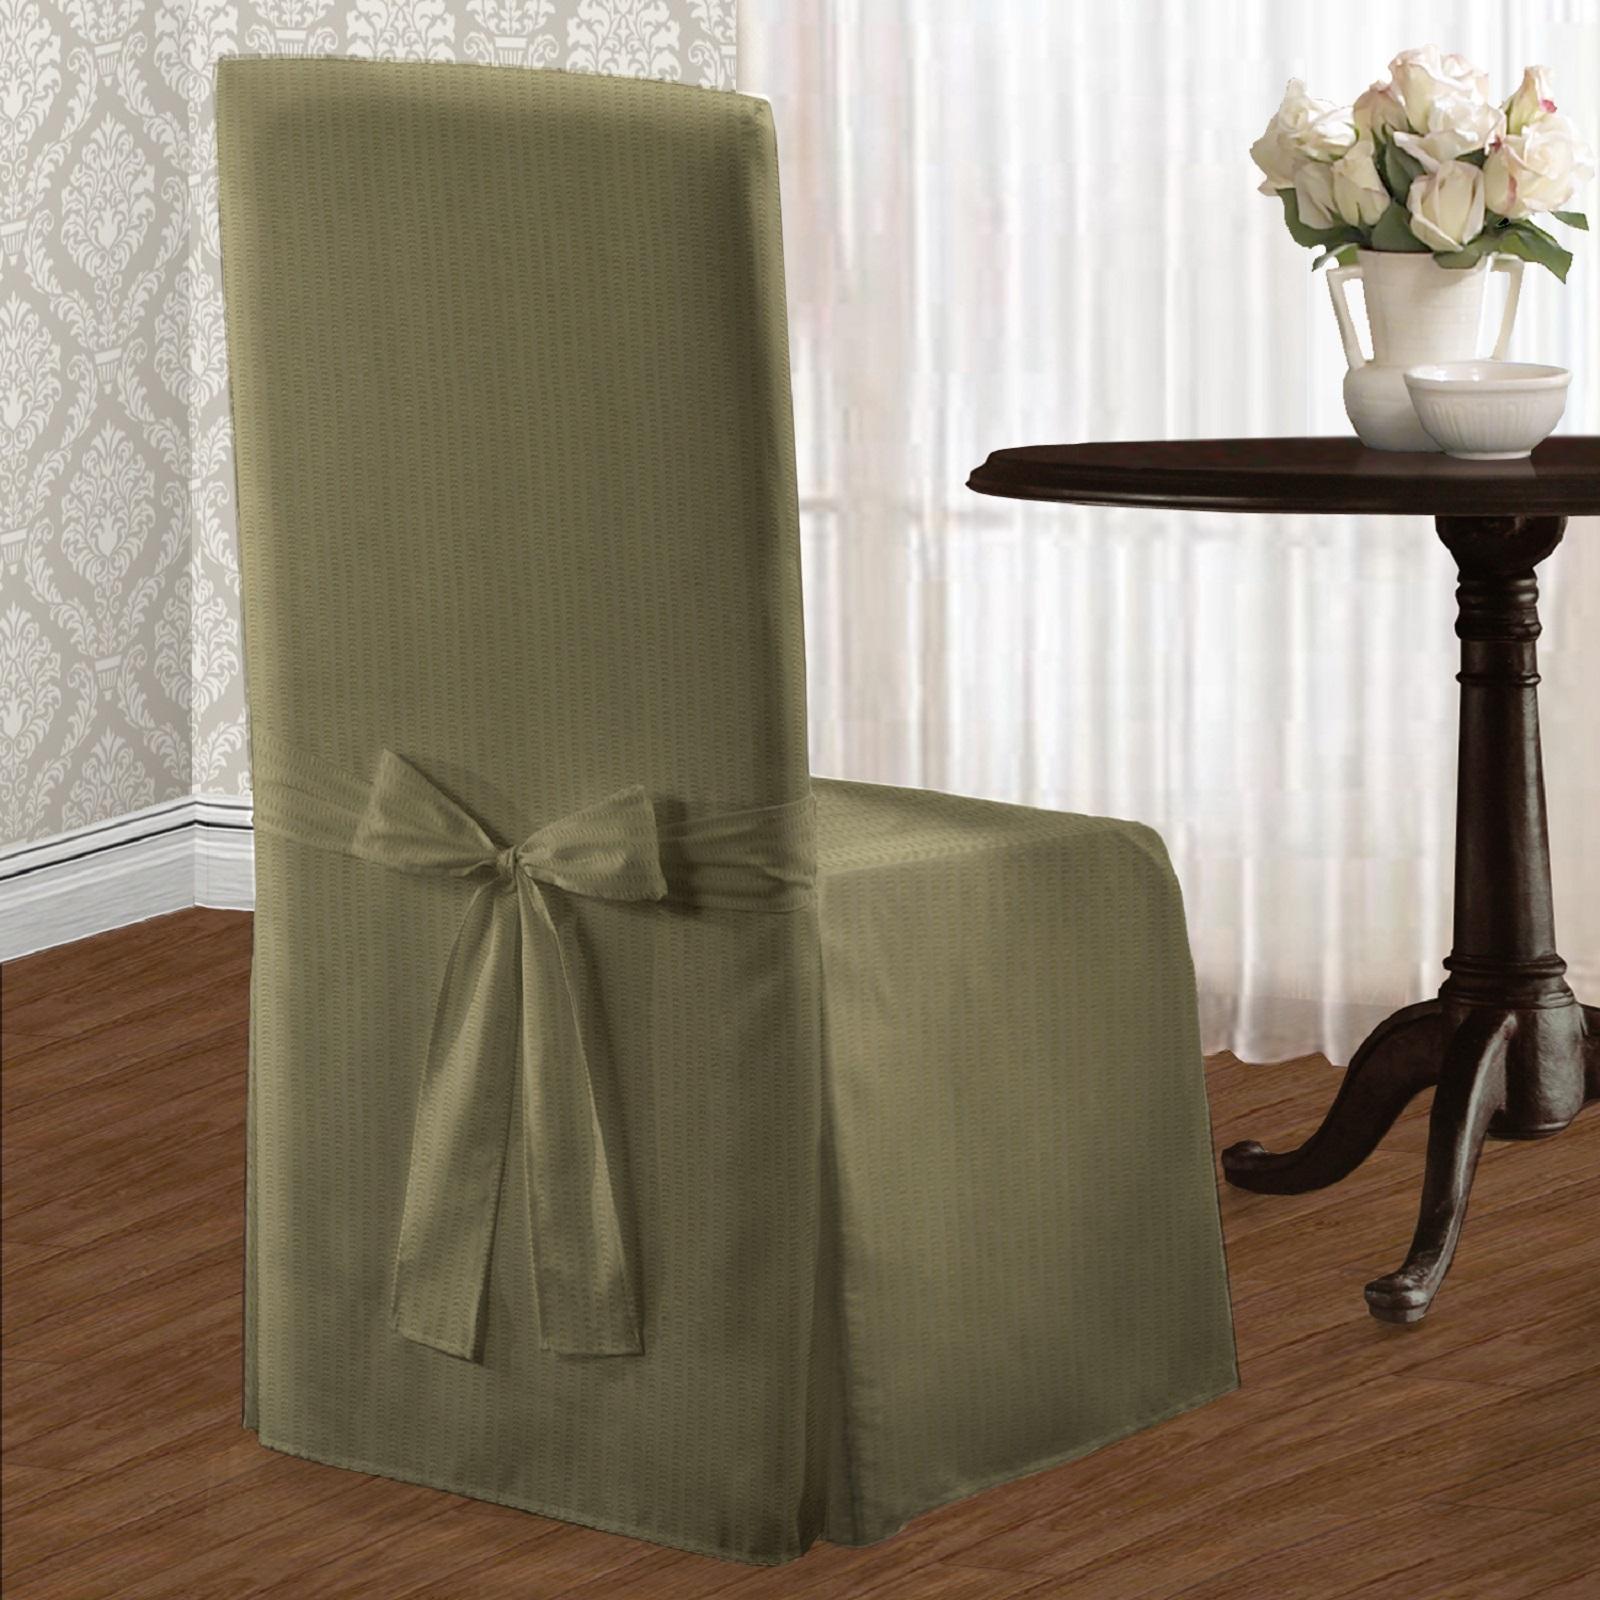 Slipcovers Chair Covers Sears